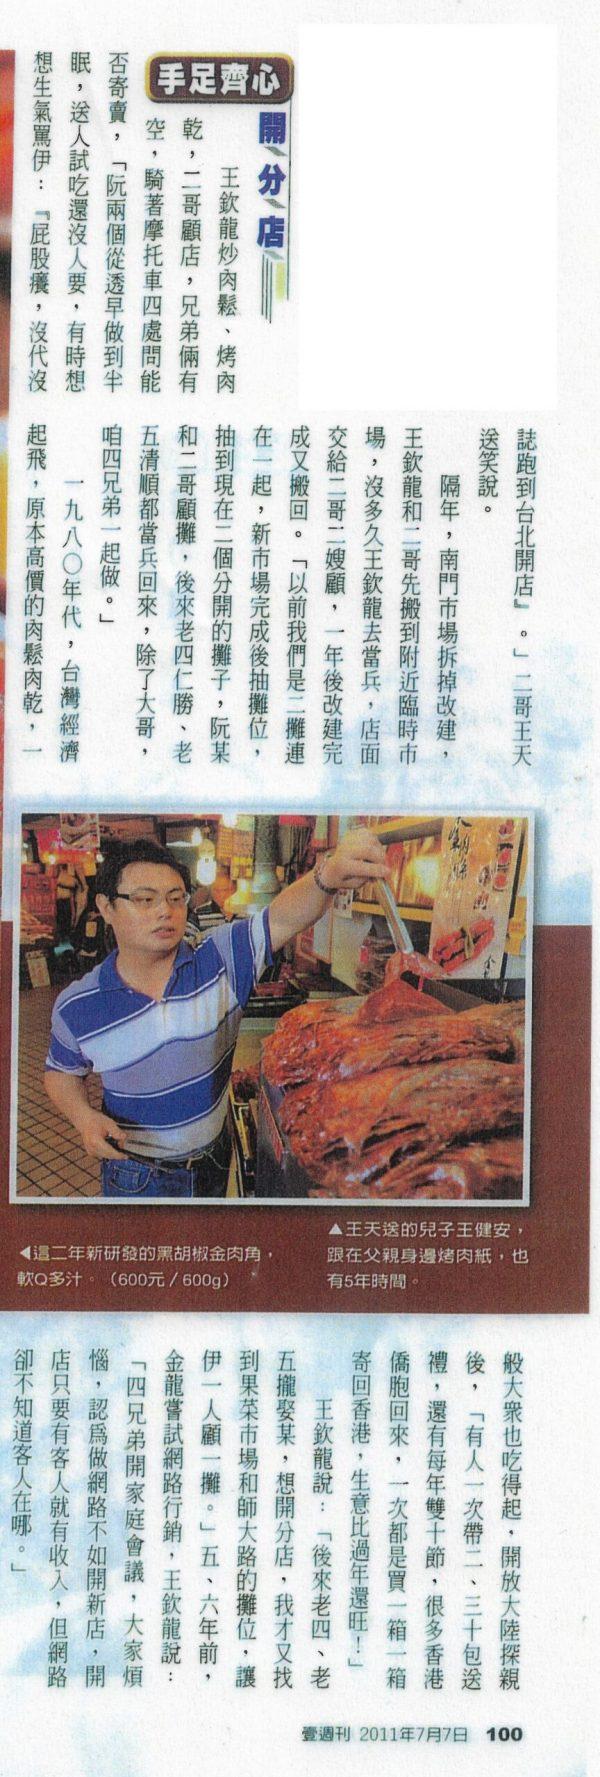 kinglongScan壹週刊20110707-04頁cropped